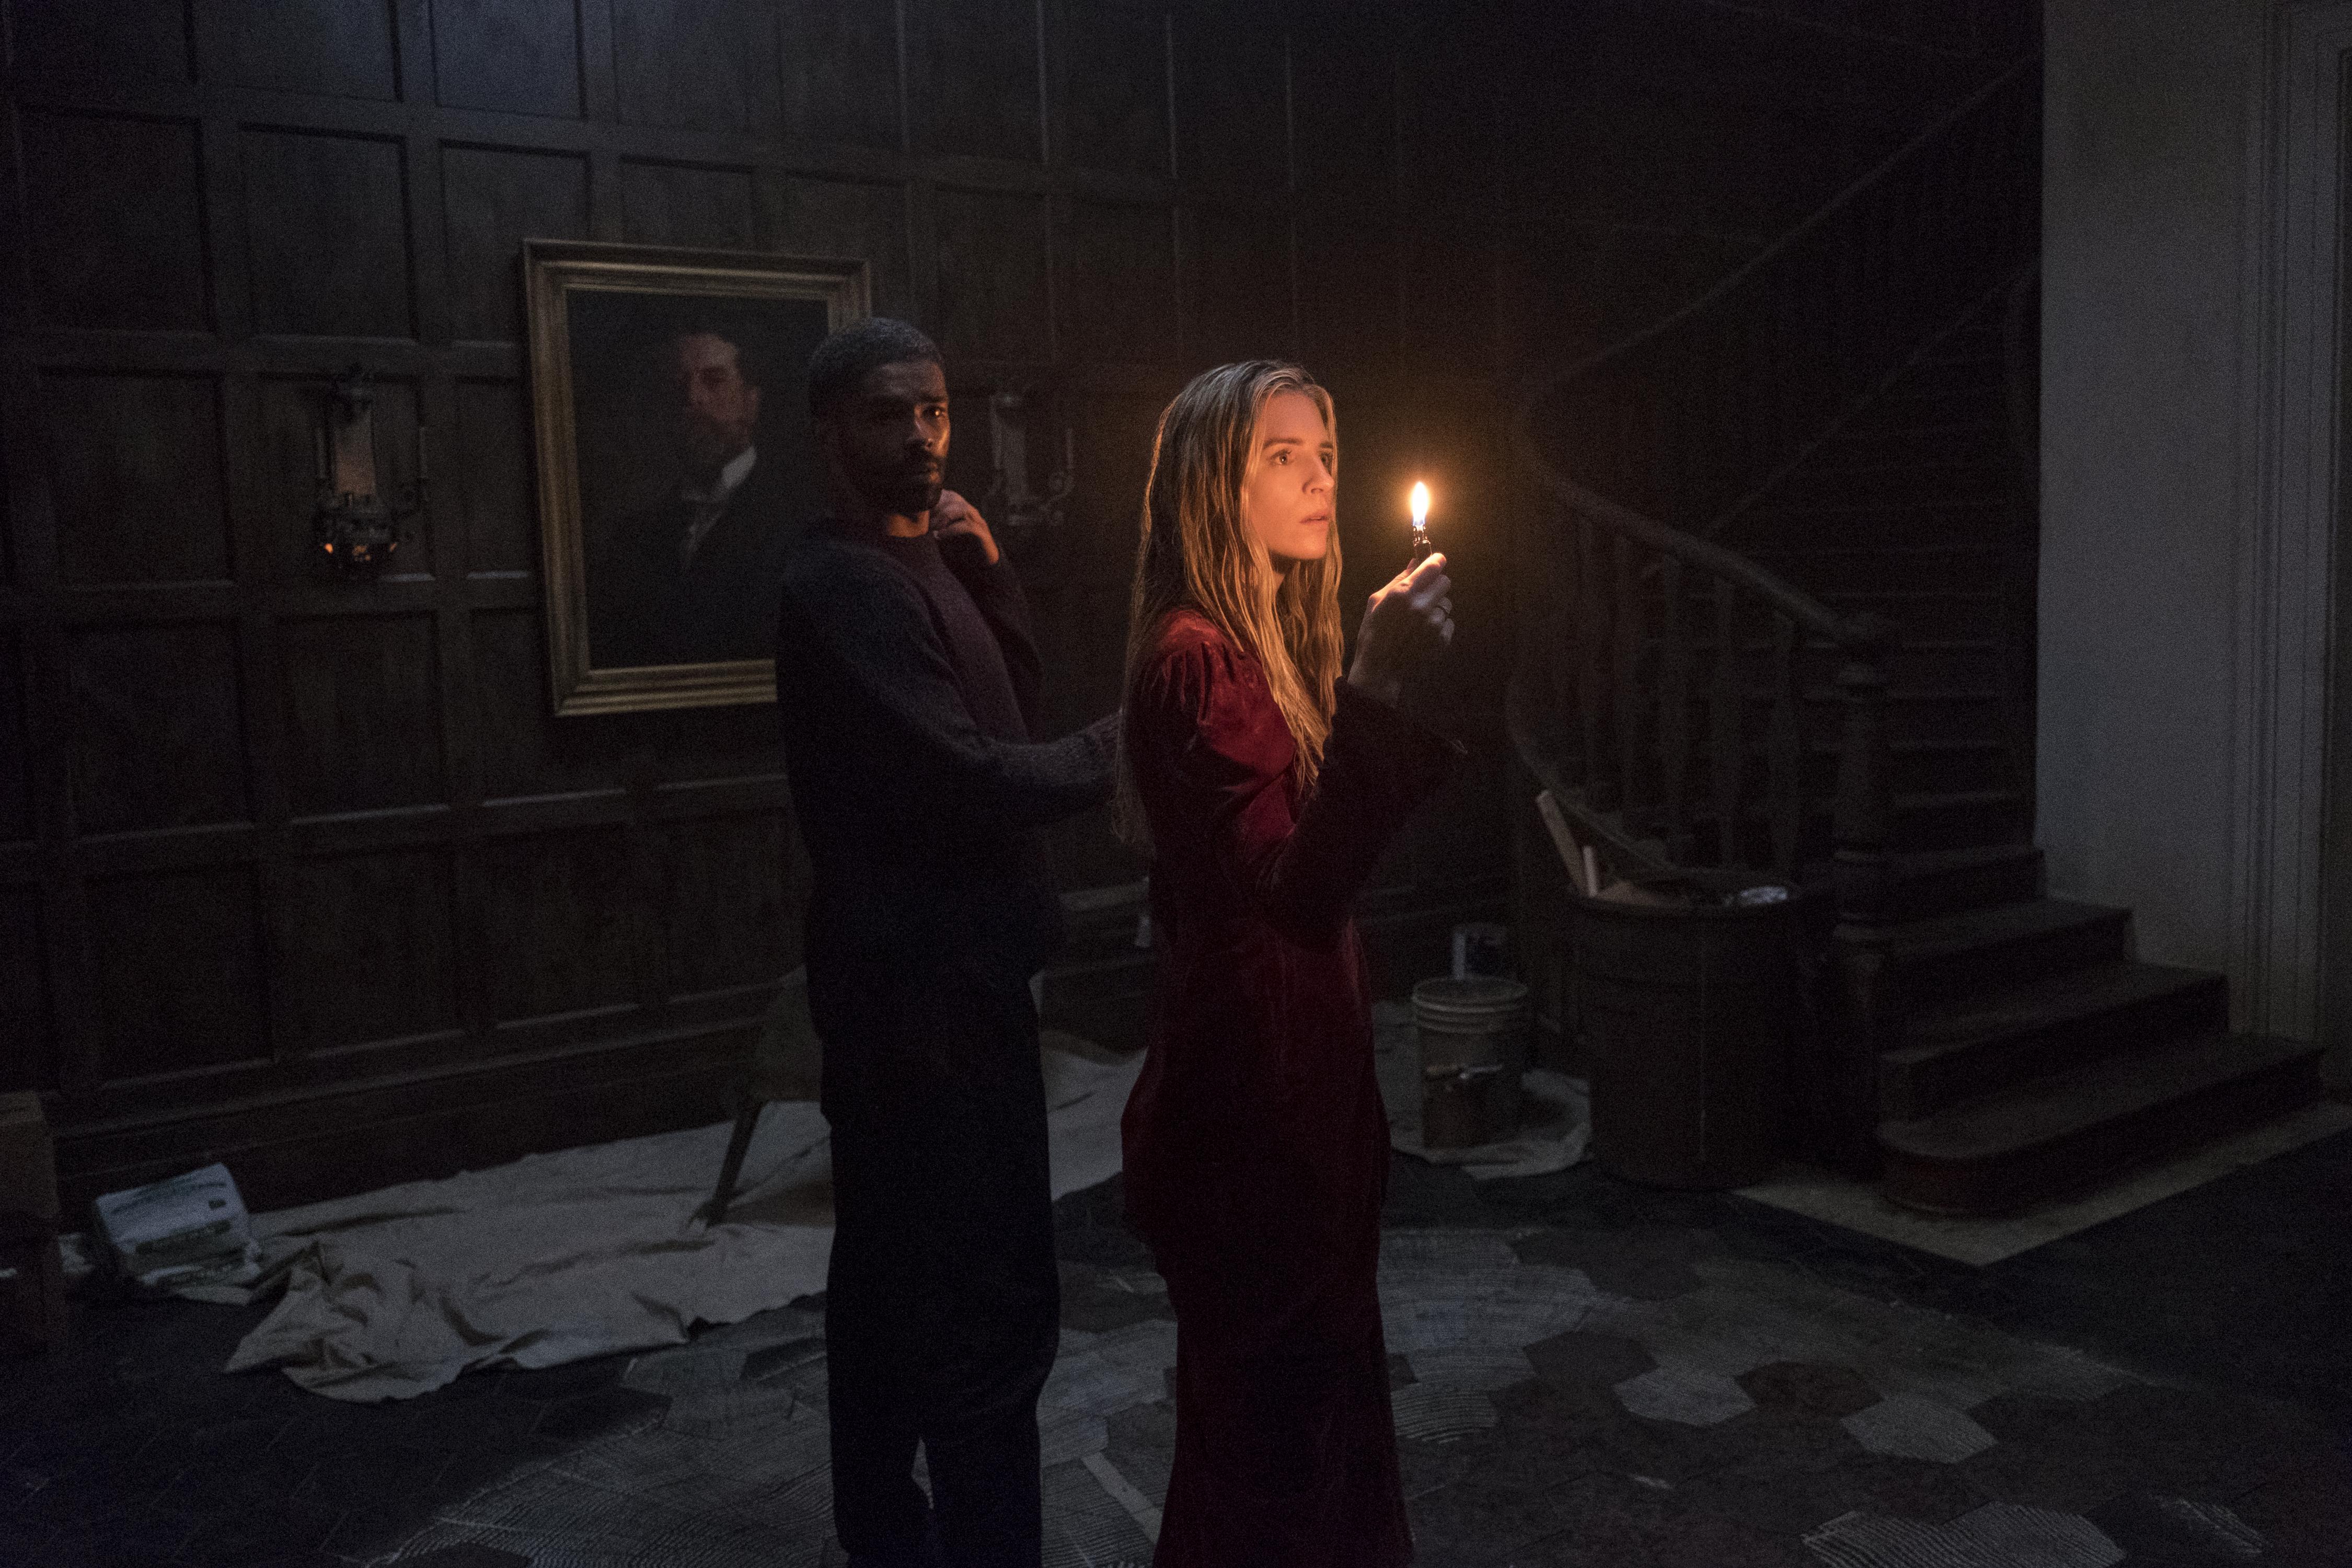 The OA' Season 3: Netflix Release Date, Trailer, Plot, Cast, and